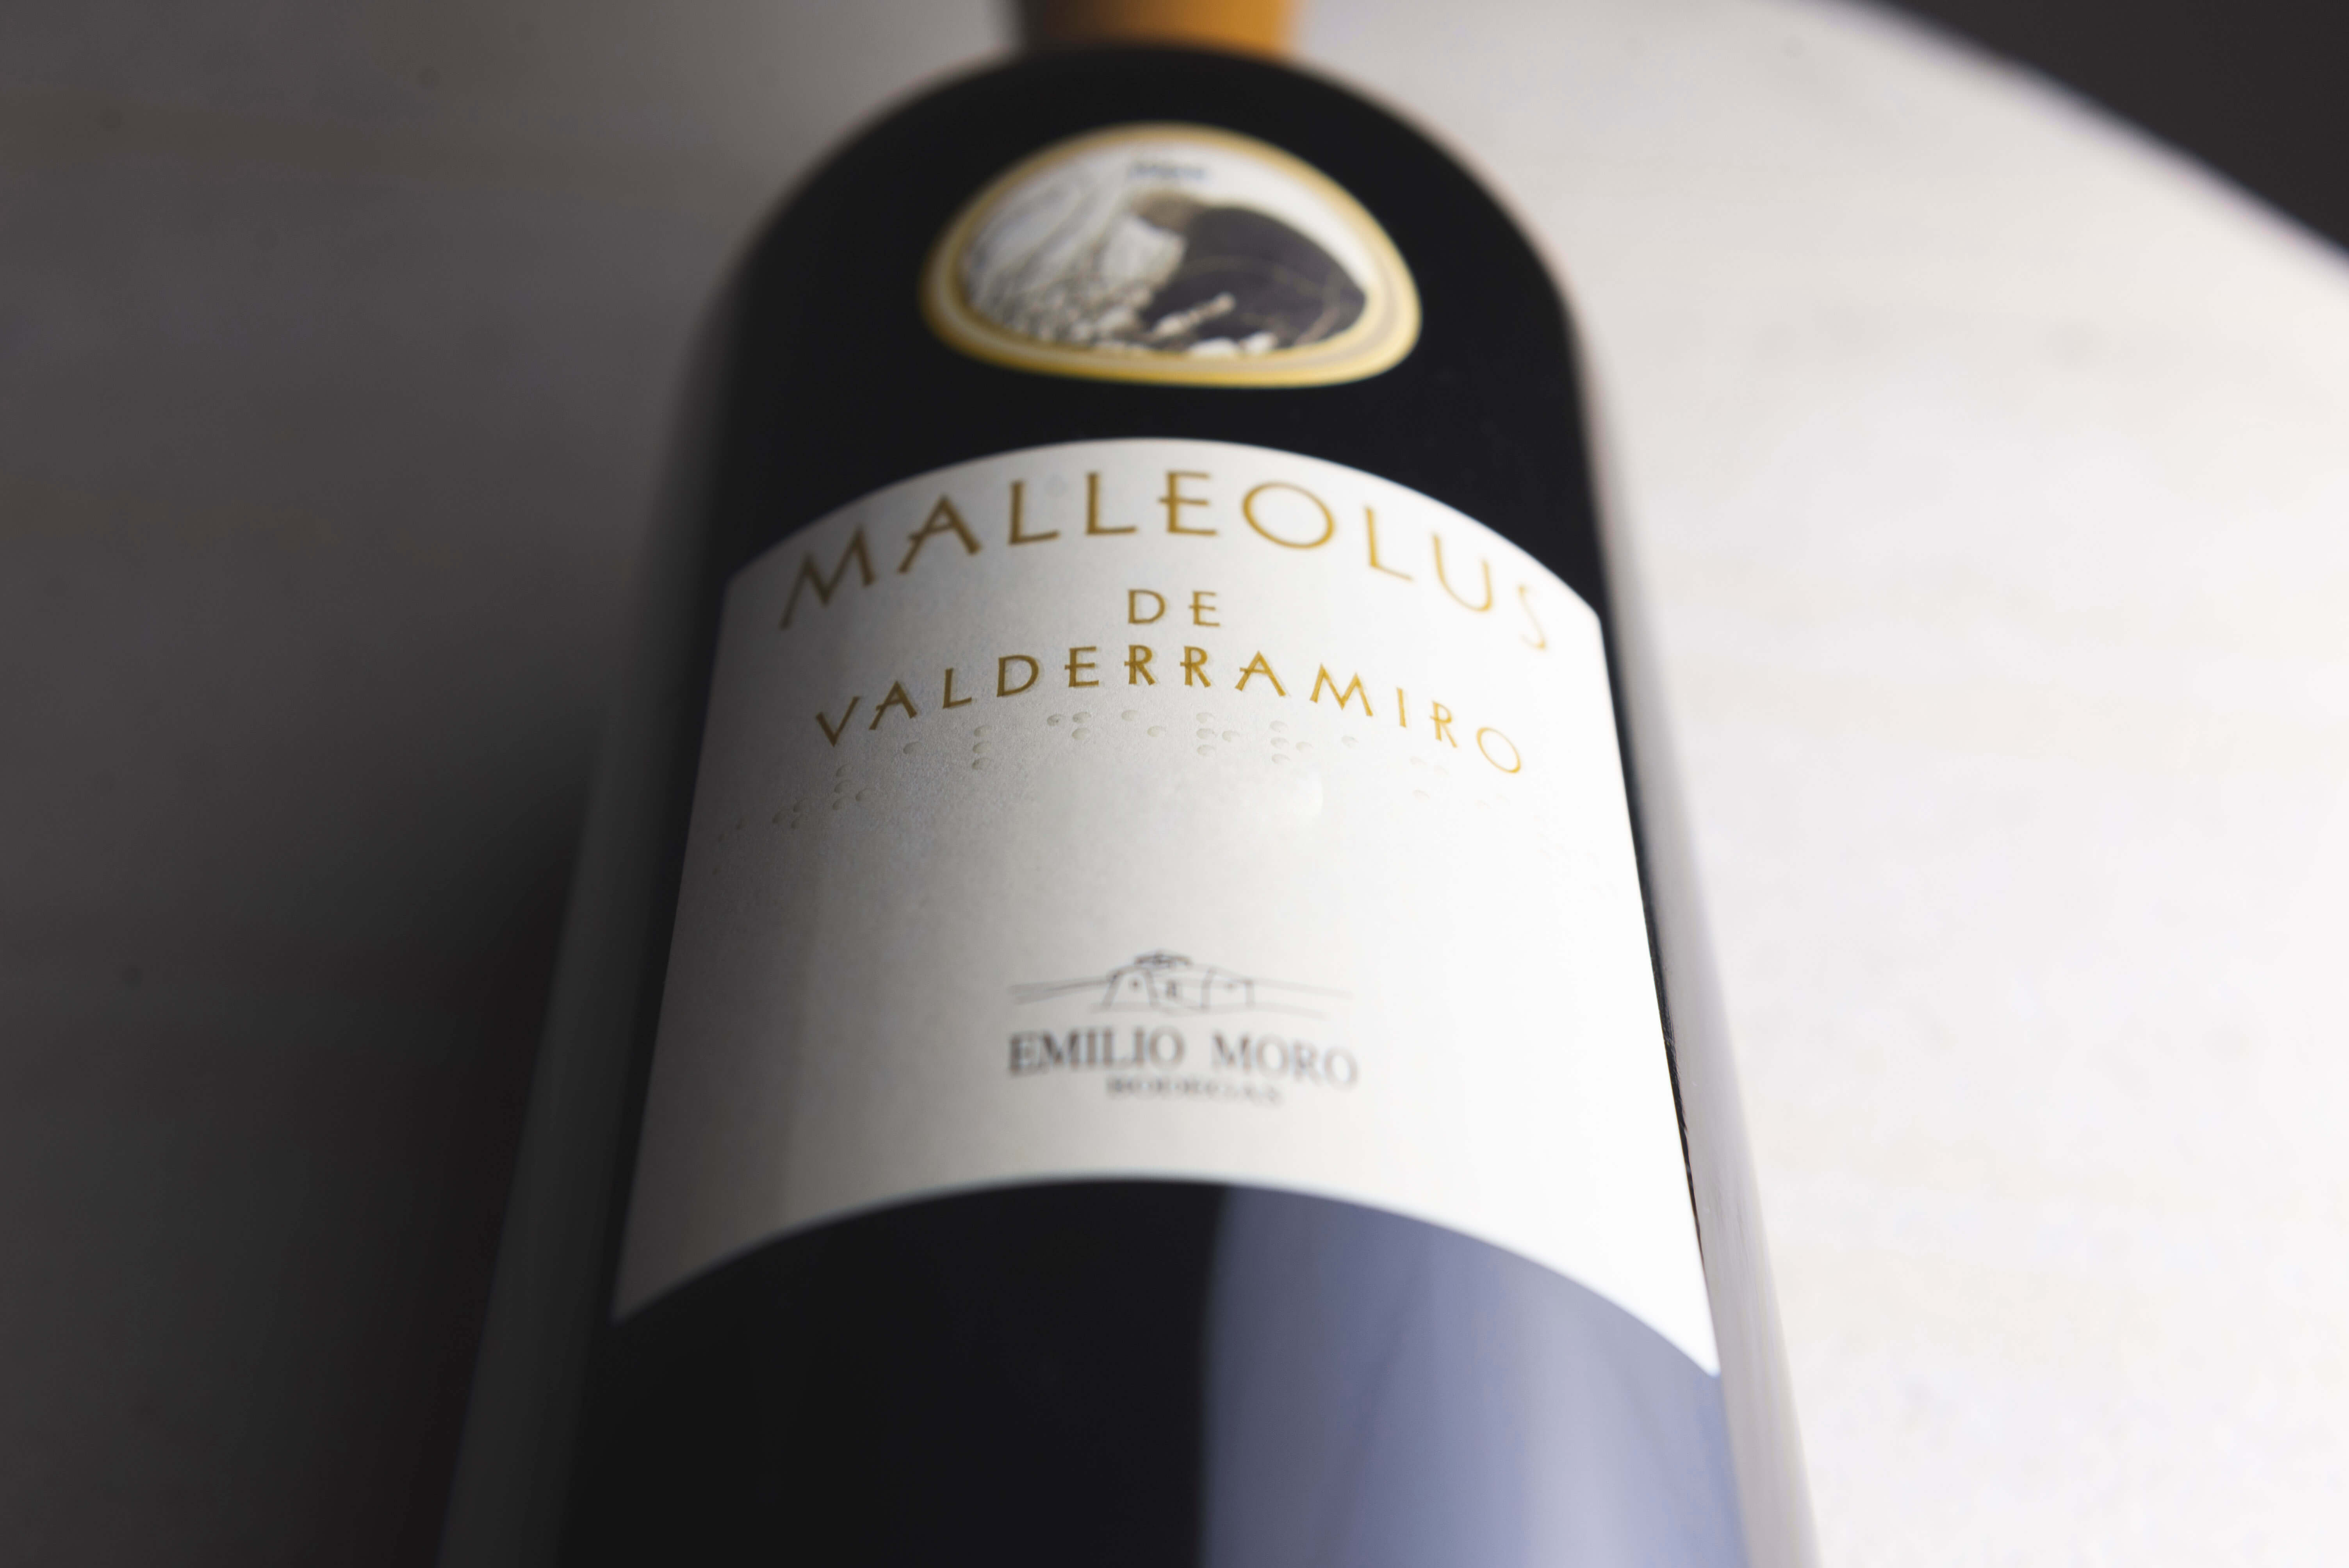 Comprar Malleolus de Valderramiro 5